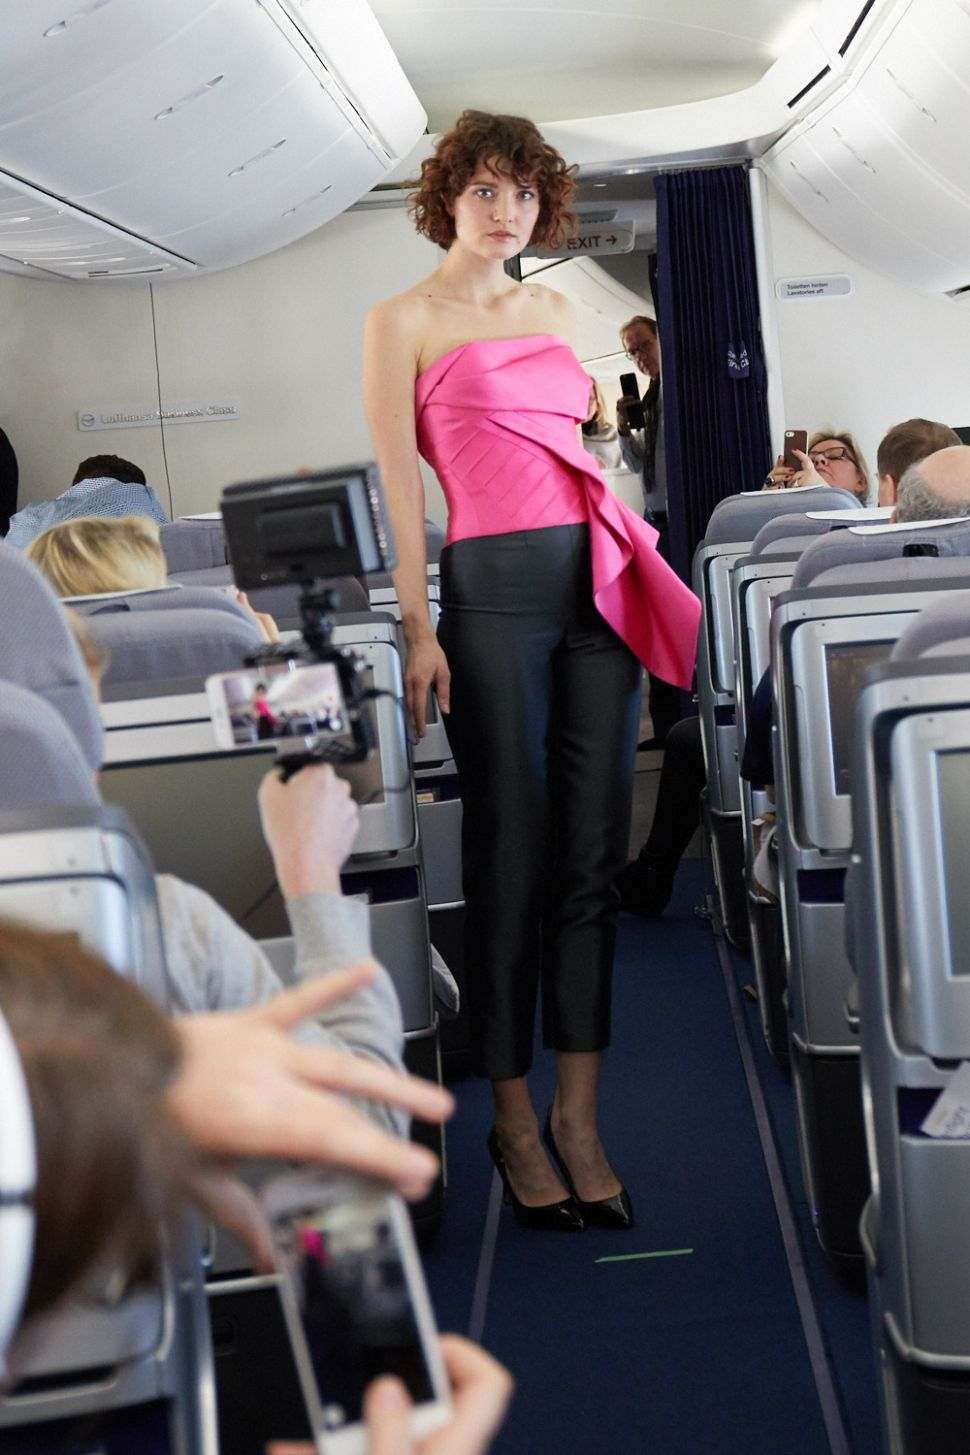 This Fashion Designer Just Held a Fashion Show on a Plane